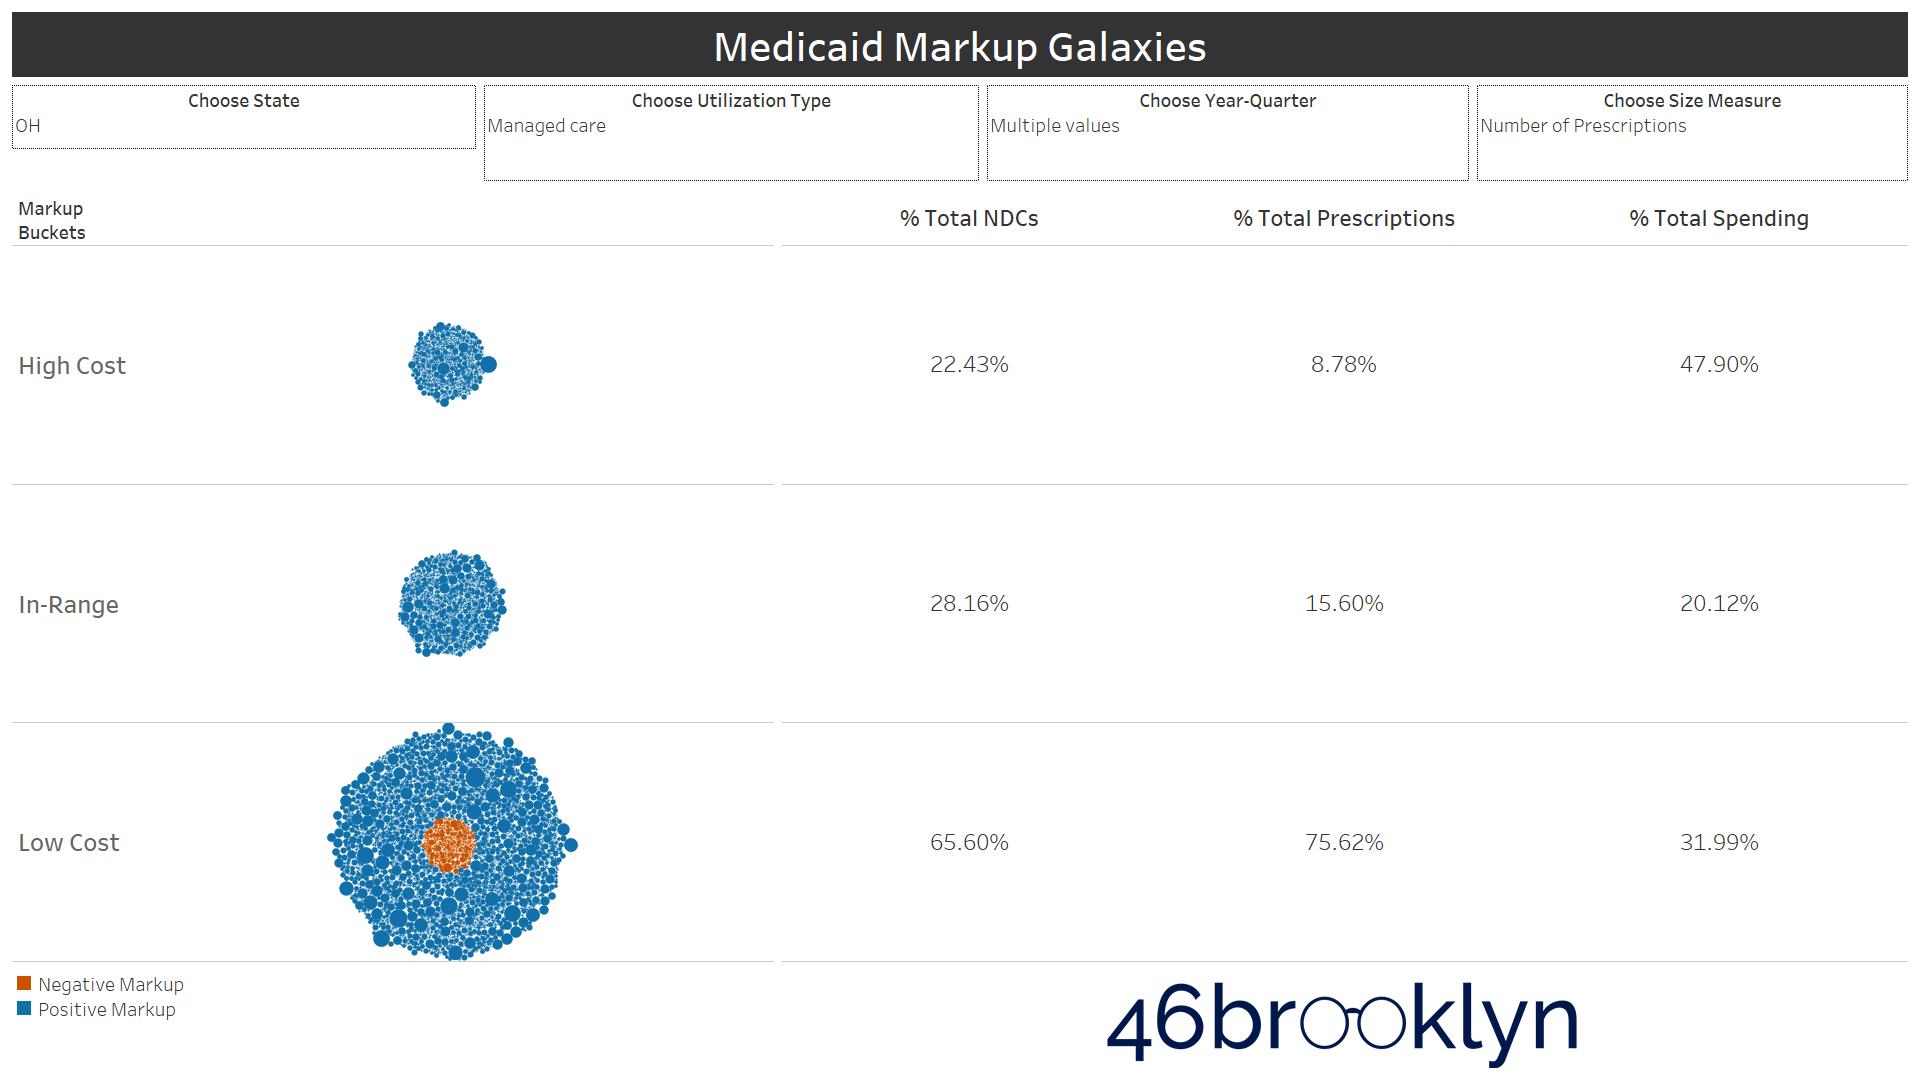 Figure 10   Source: Data.Medicaid.gov, 46brooklyn Research